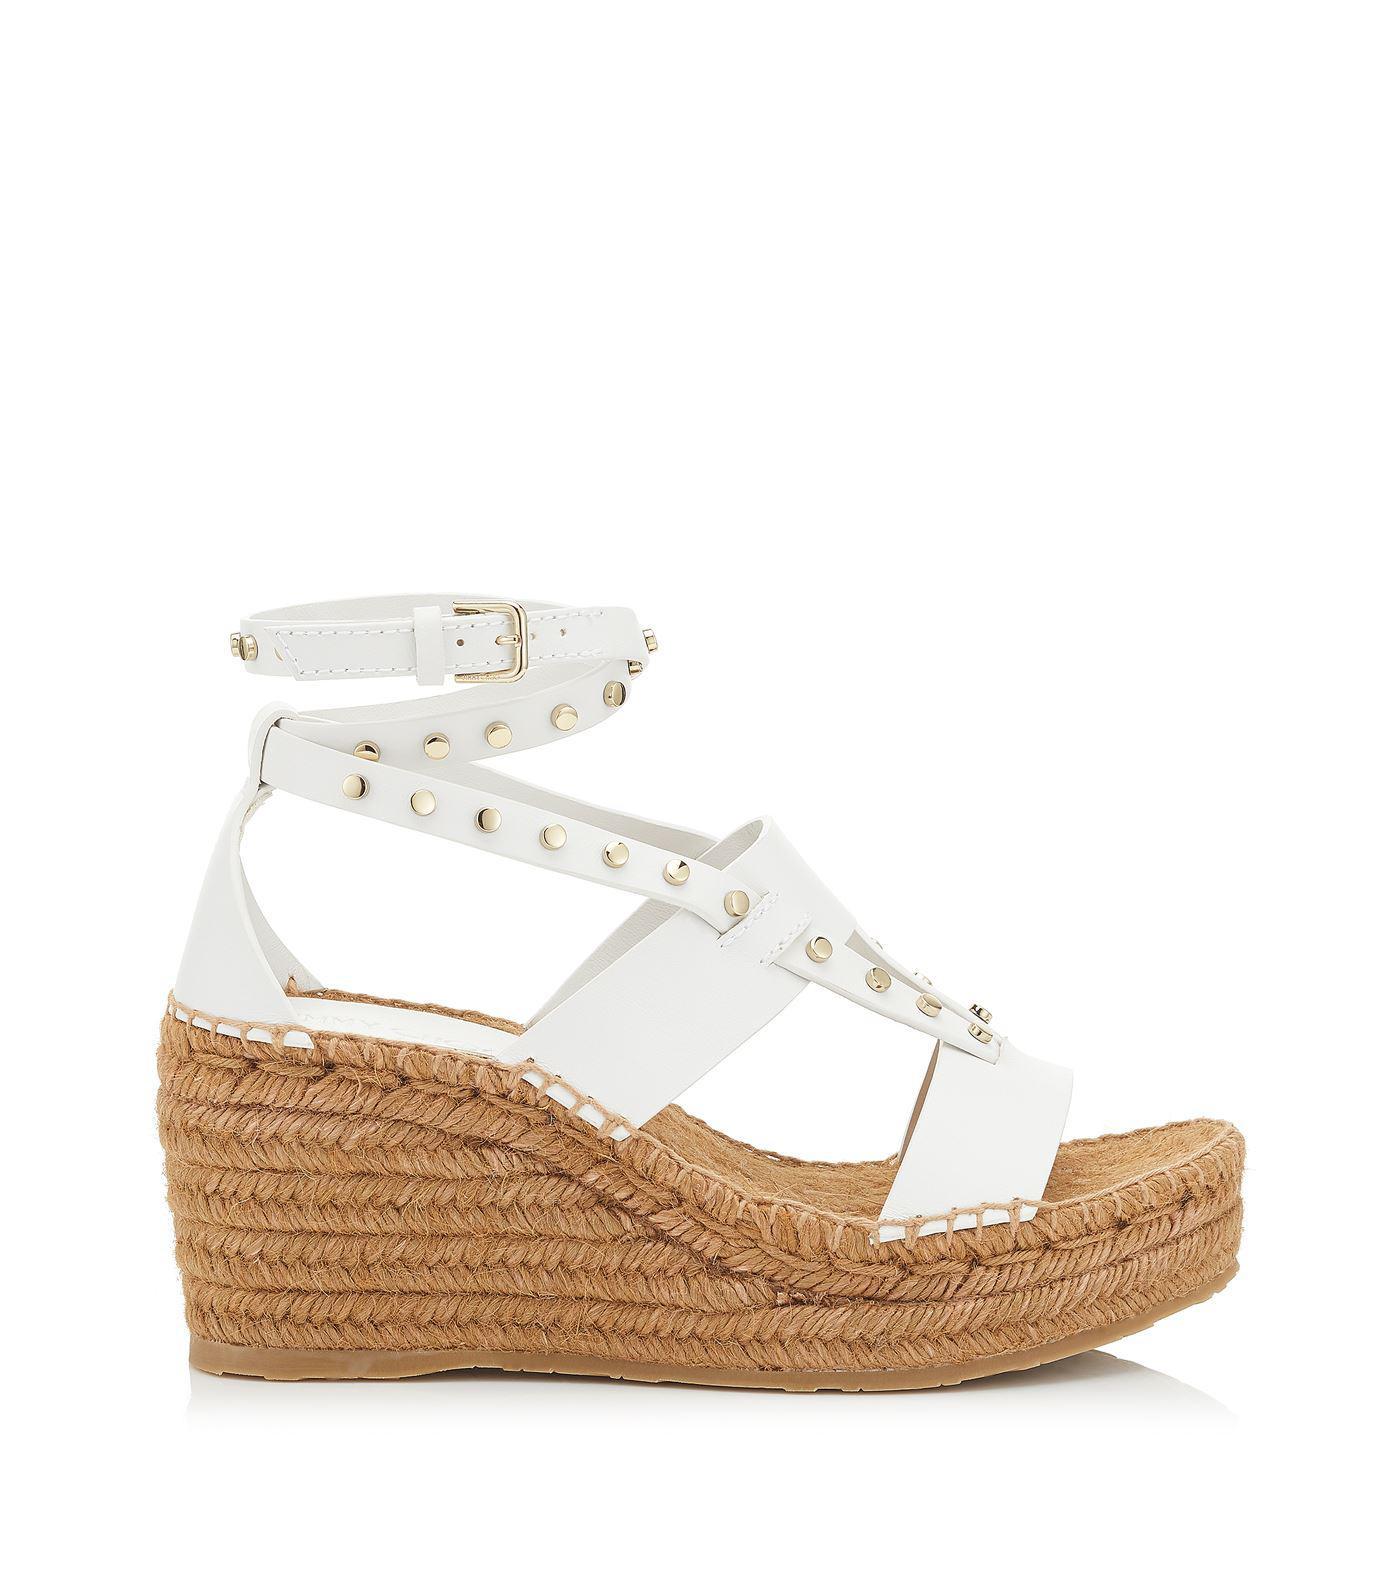 bda440058ac4 Lyst - Jimmy Choo Danica 80 Espadrille Sandals in White